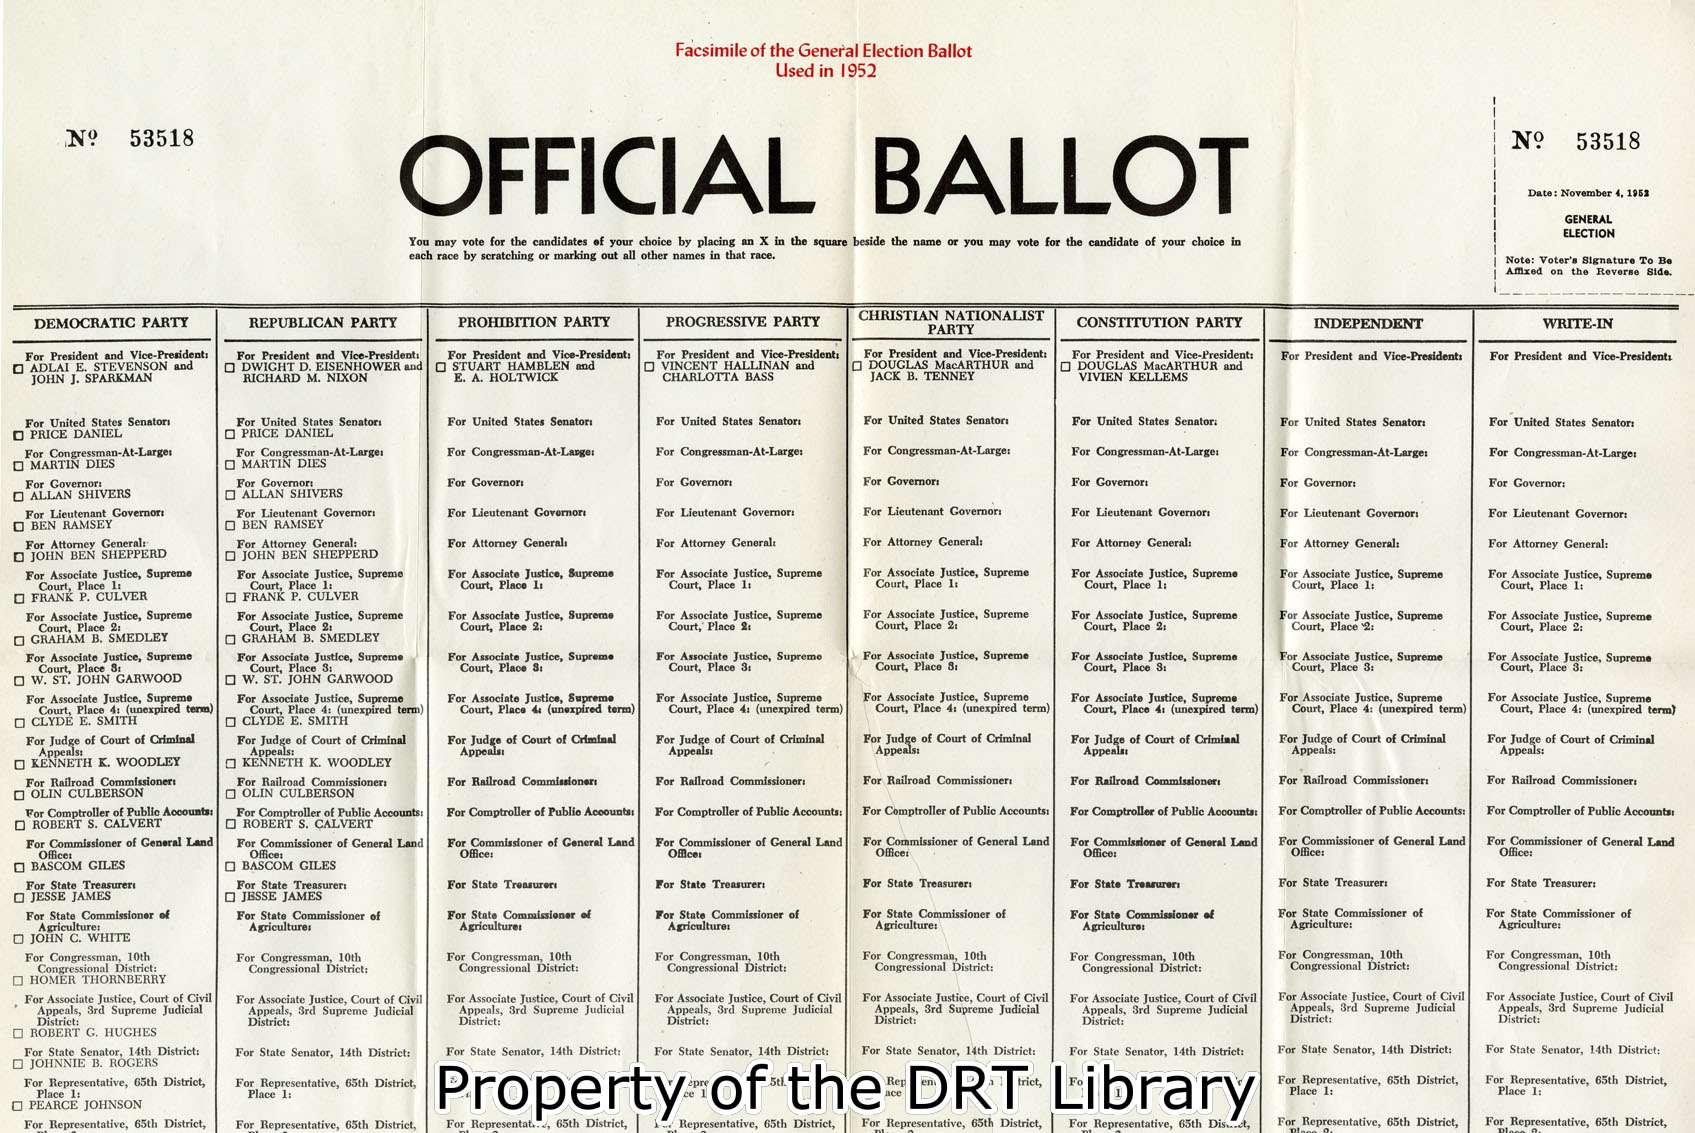 Facsimile ballot for the 1952 election from the handbook for texas